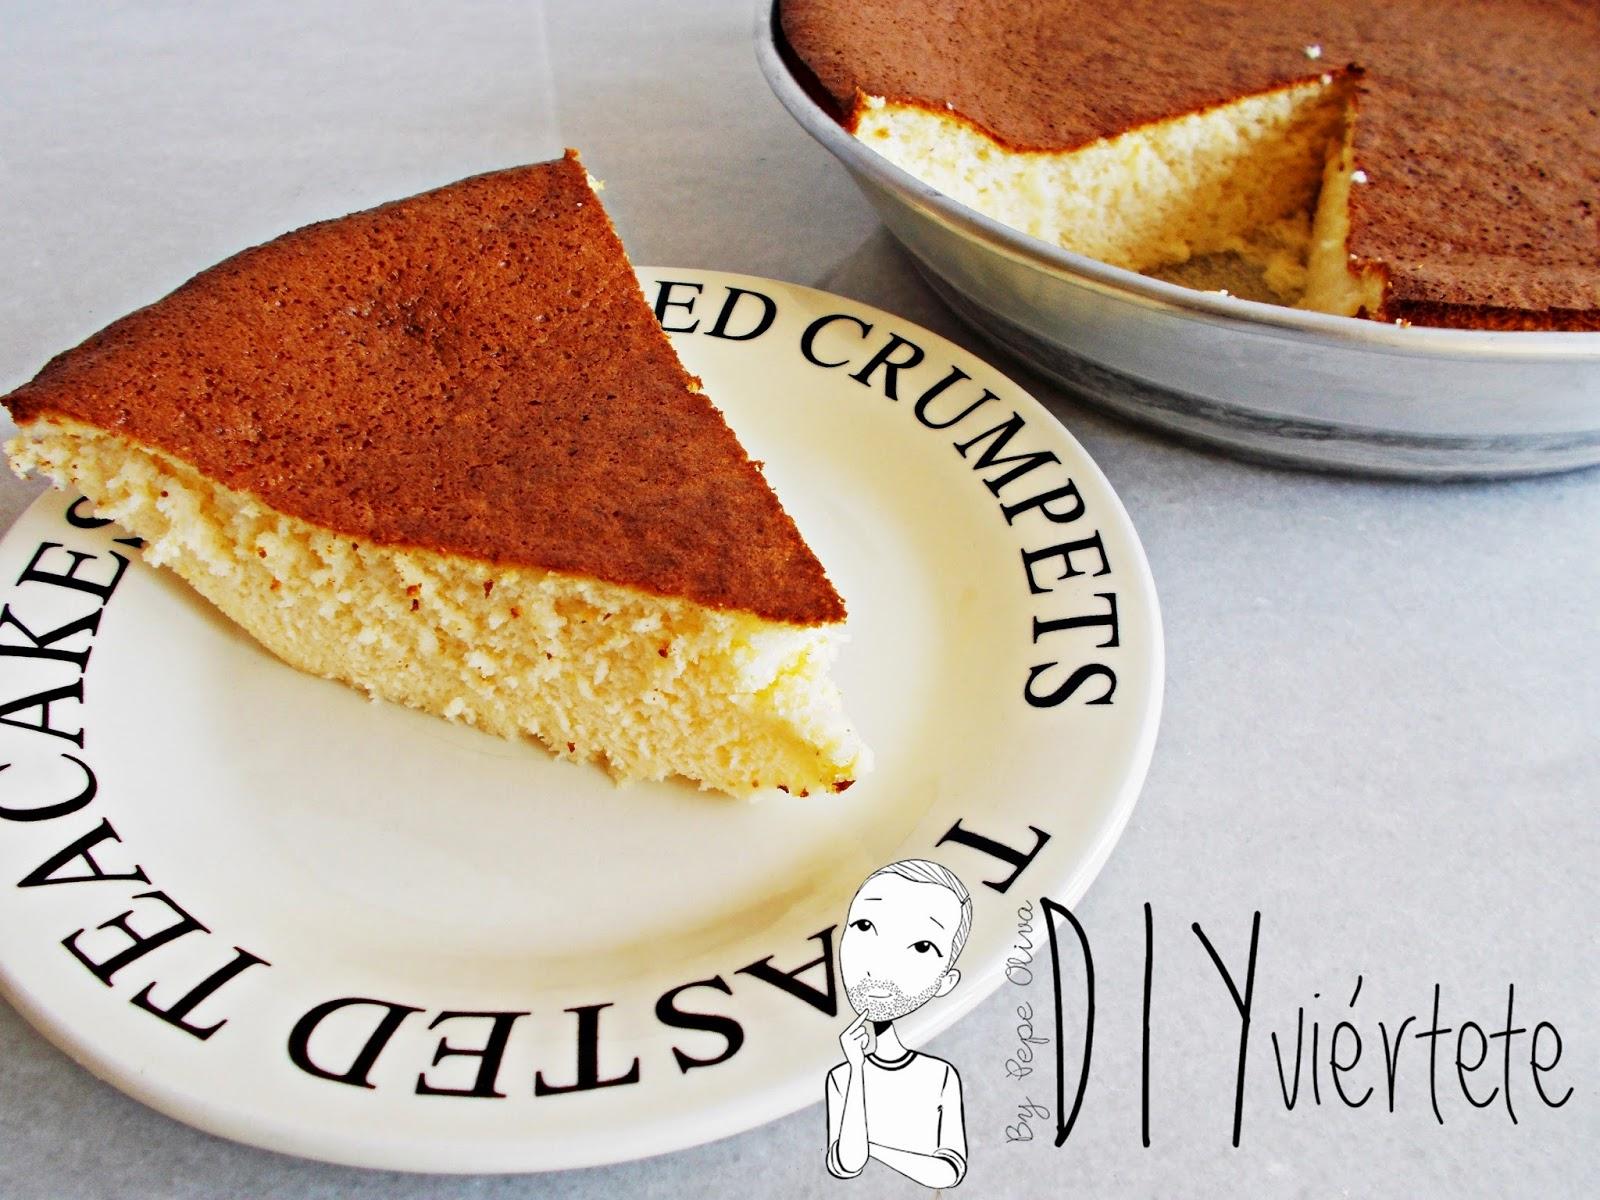 Receta-cocina-postre-repostería-bizcocho-soft cotton cake-tarta de queso japonesa-